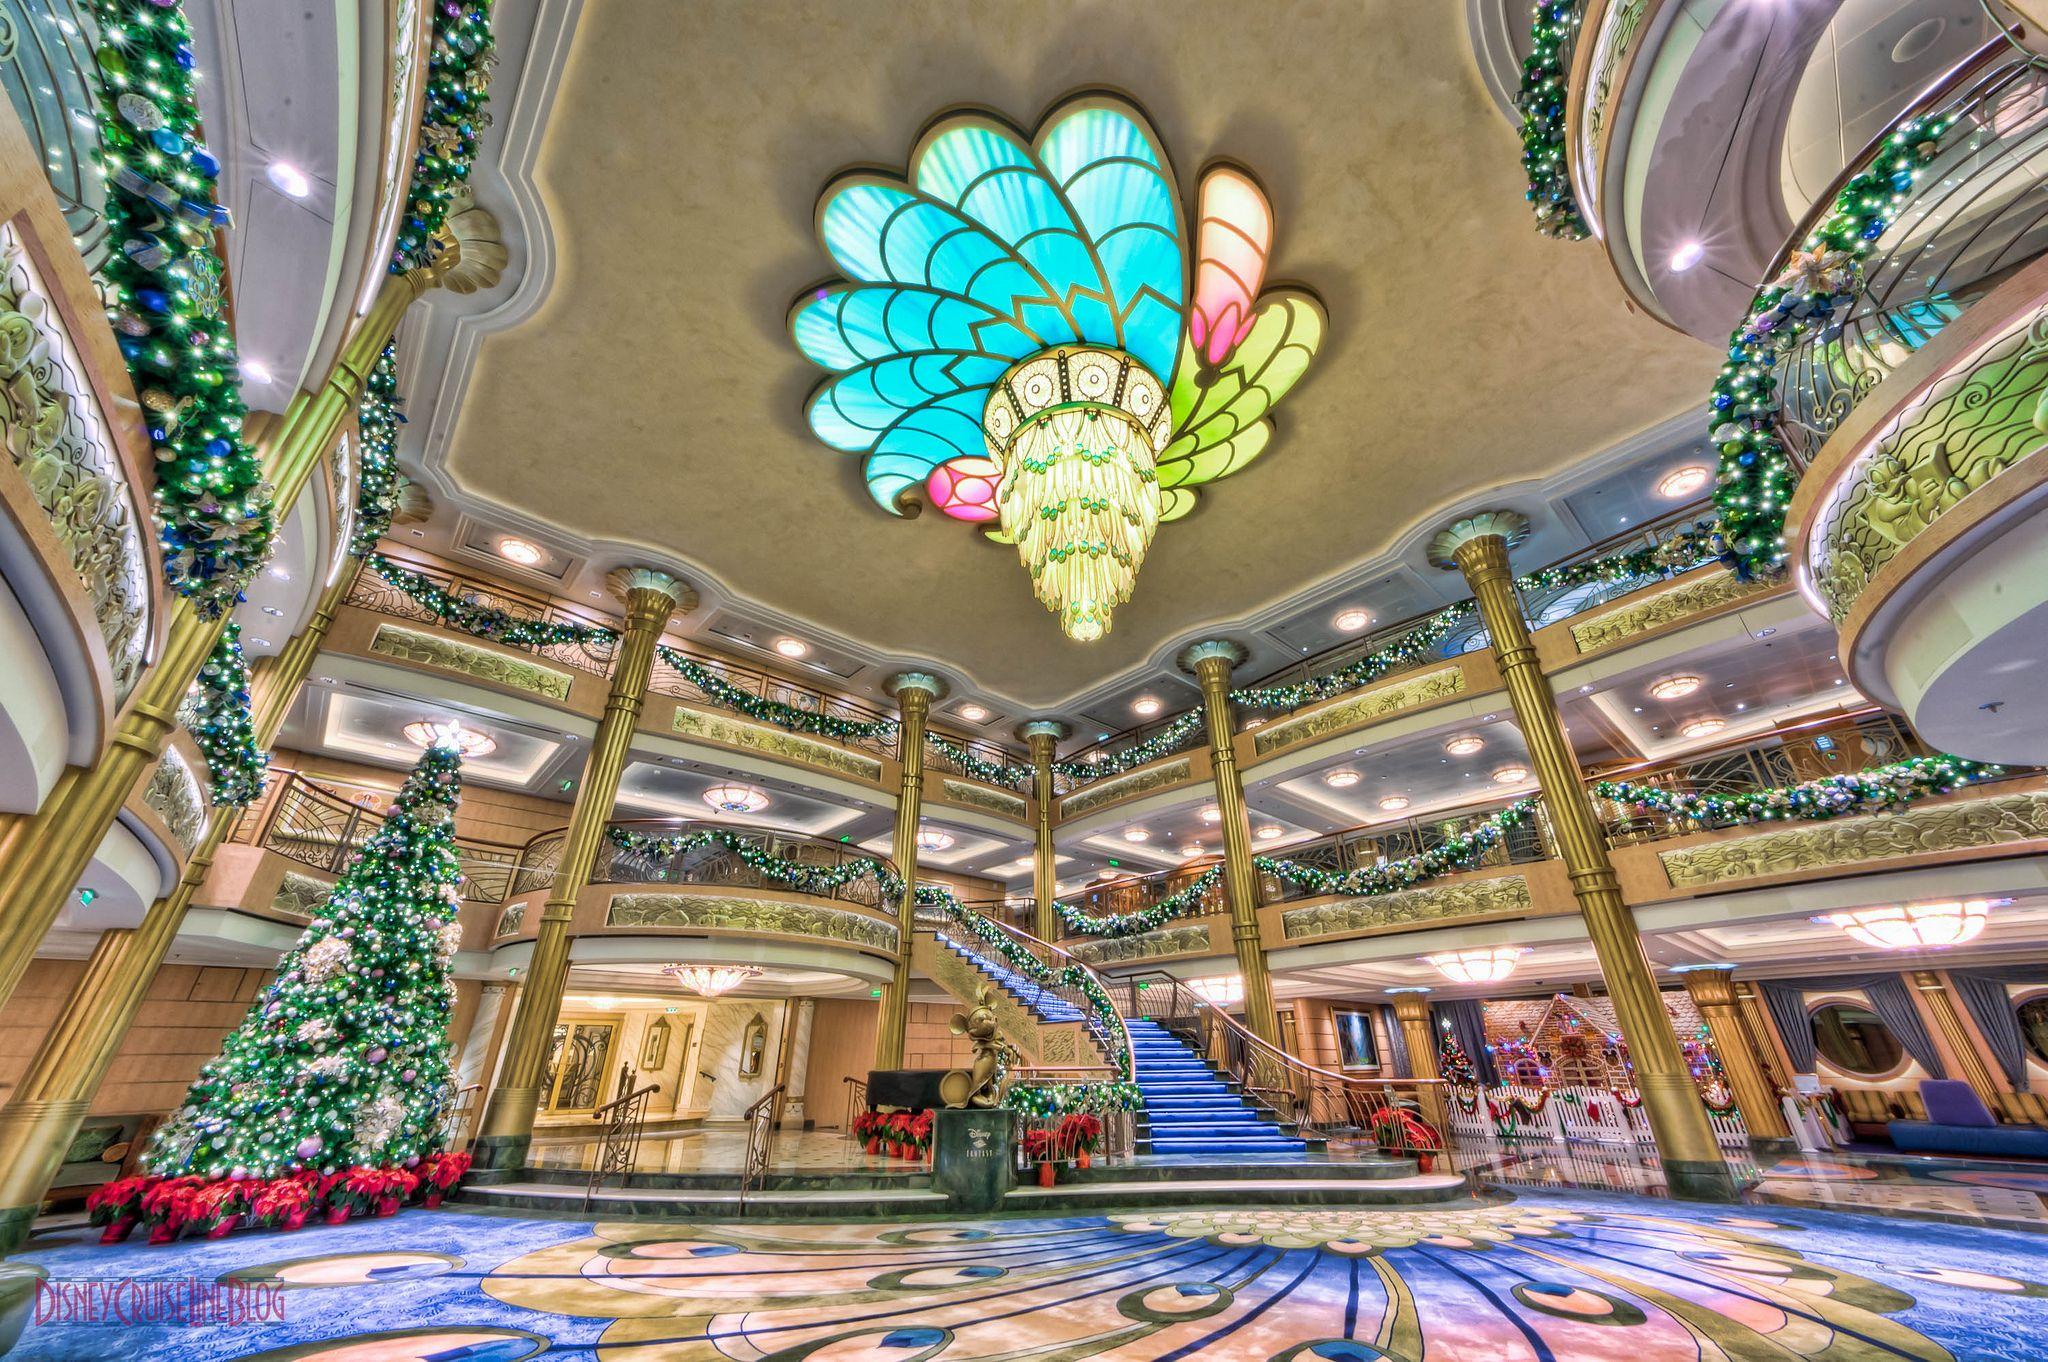 Disney Fantasy Atrium Lobby Christmas Decorations(画像あり)